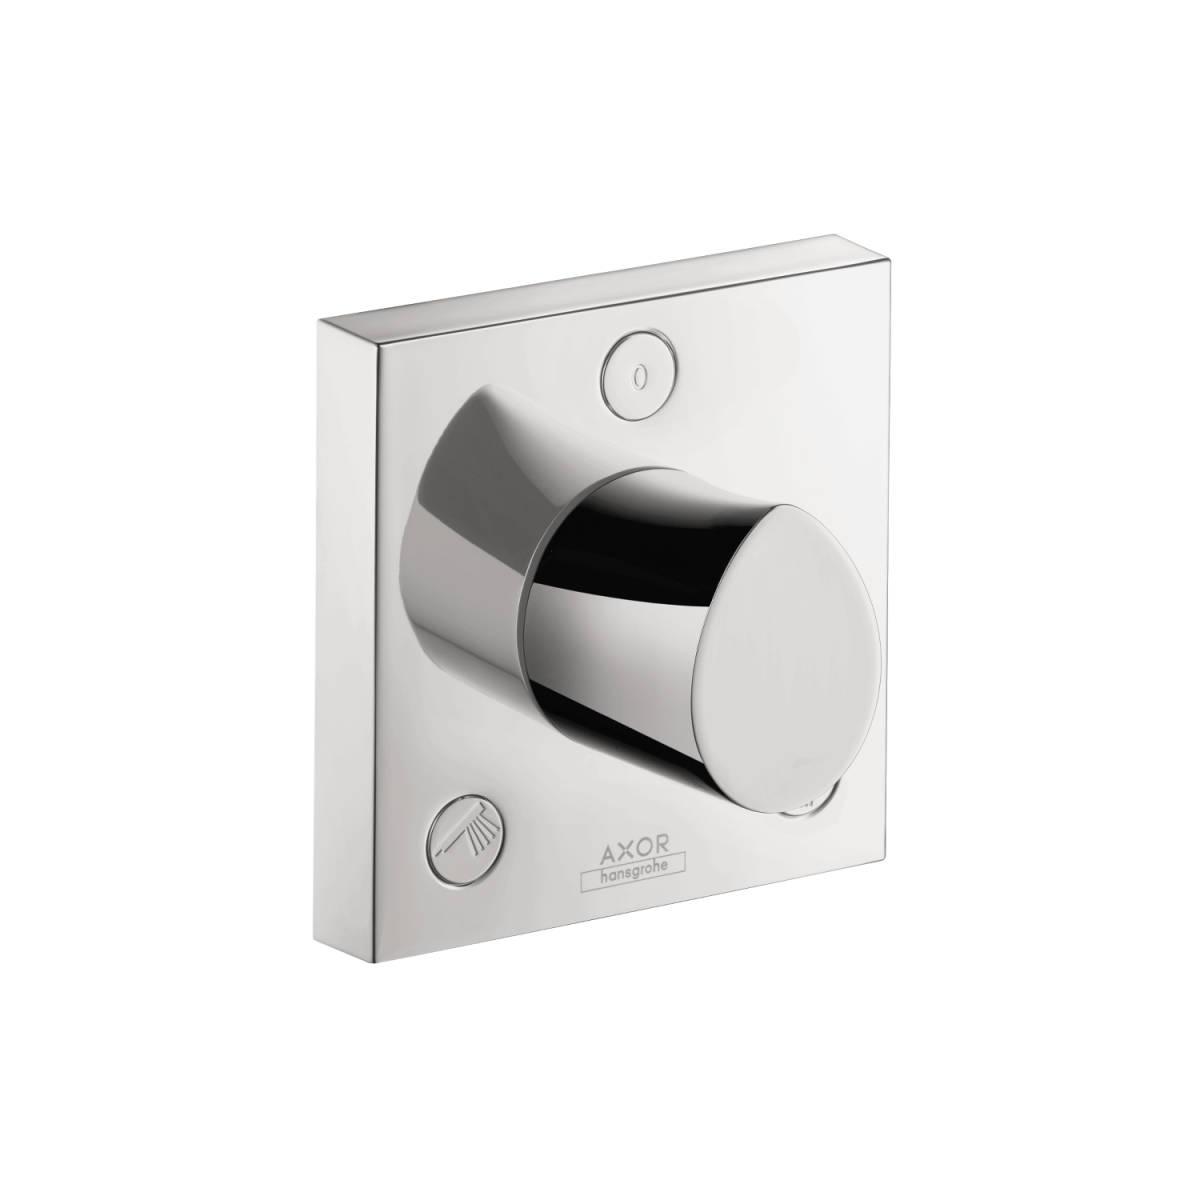 Shut-off/ diverter valve Trio/ Quattro 120/120 for concealed installation, Chrome, 12731001